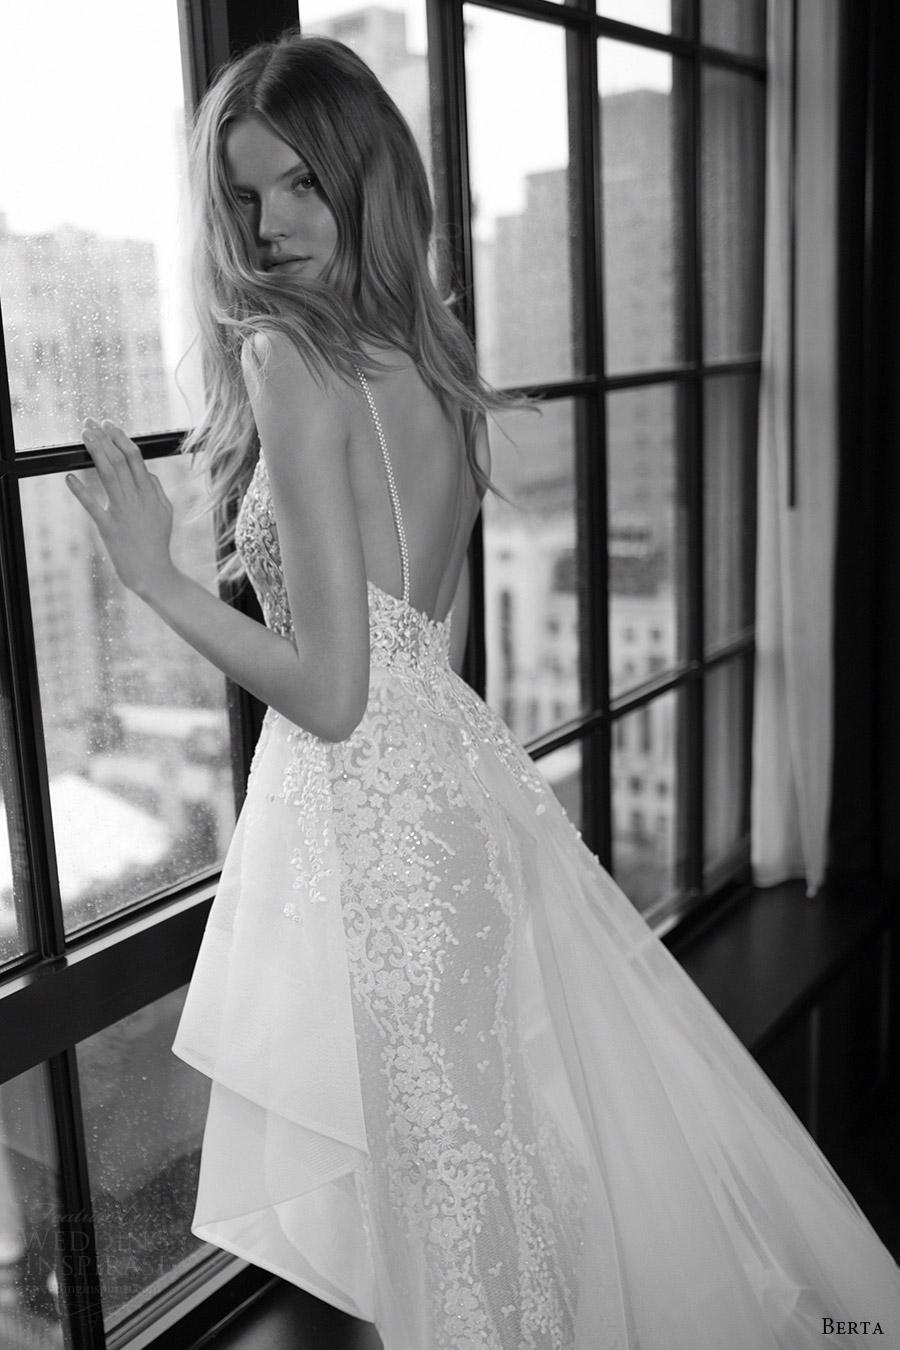 berta bridal fall 2016 sleeveless vneck sheath wedding dress (16 108) zbv overskirt train